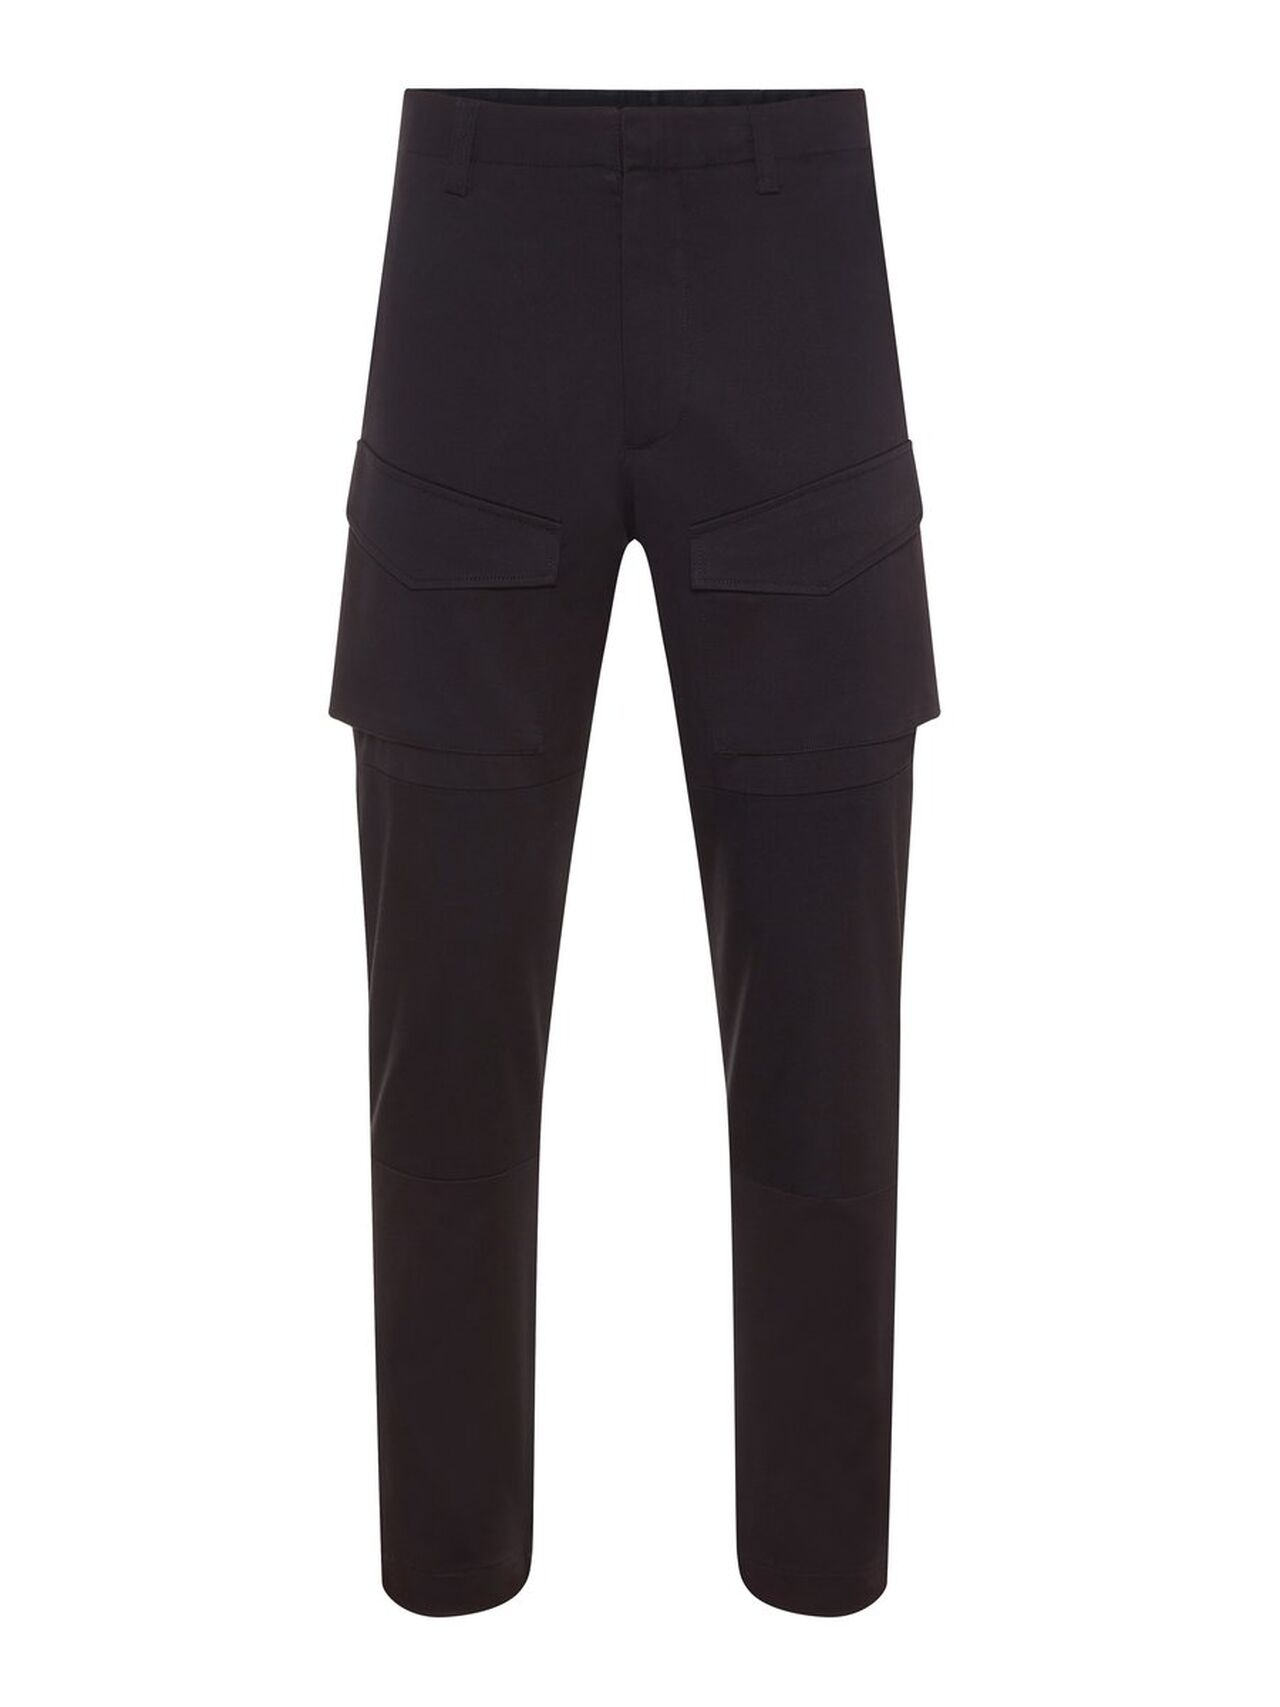 J.LINDEBERG Mike Cargo Travel Cotton Trousers Man Svart